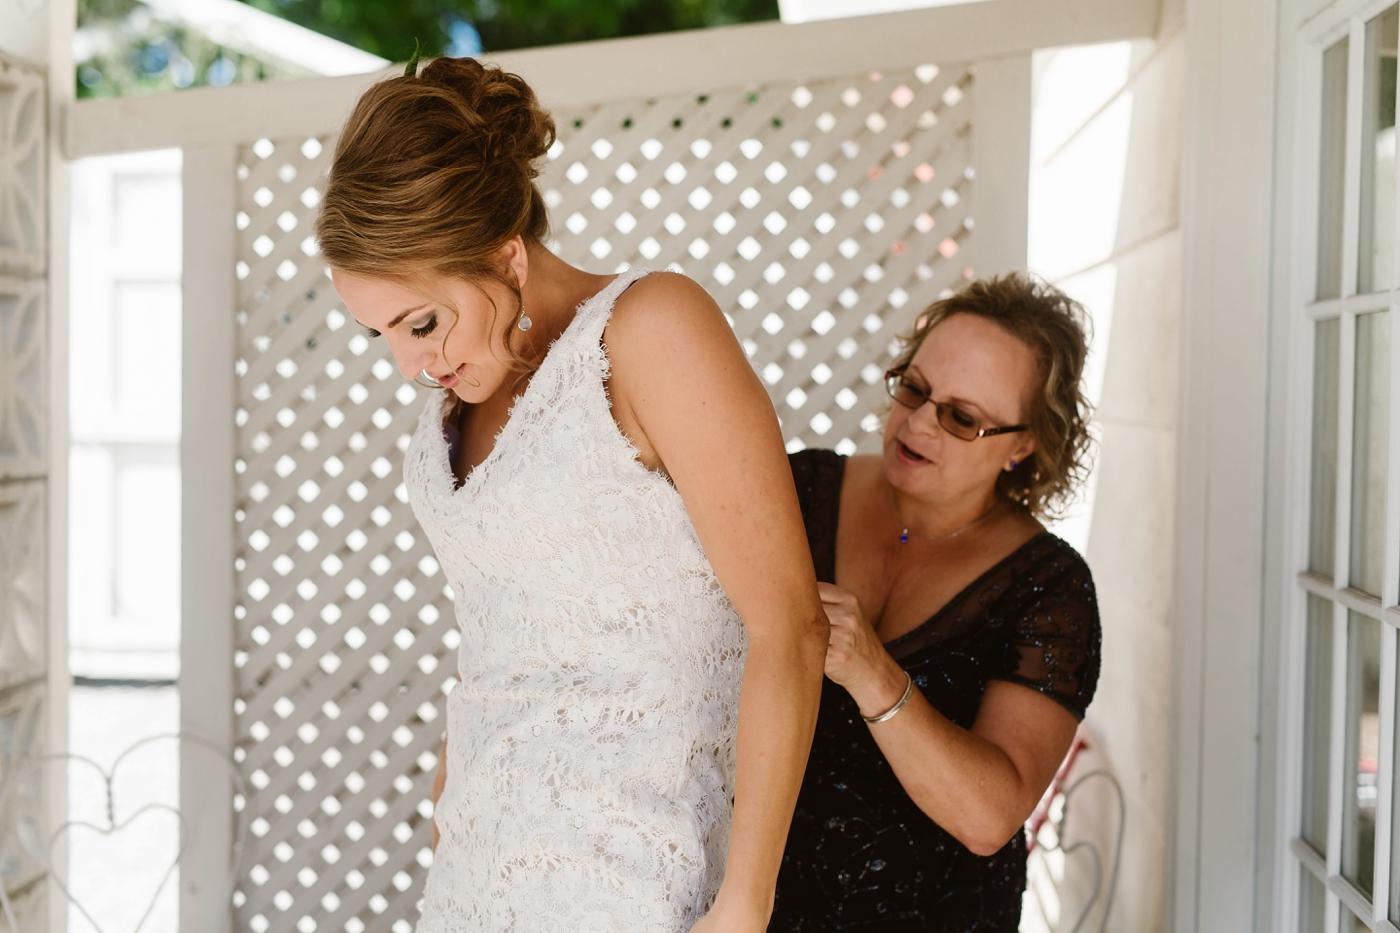 mom putting on brides dress